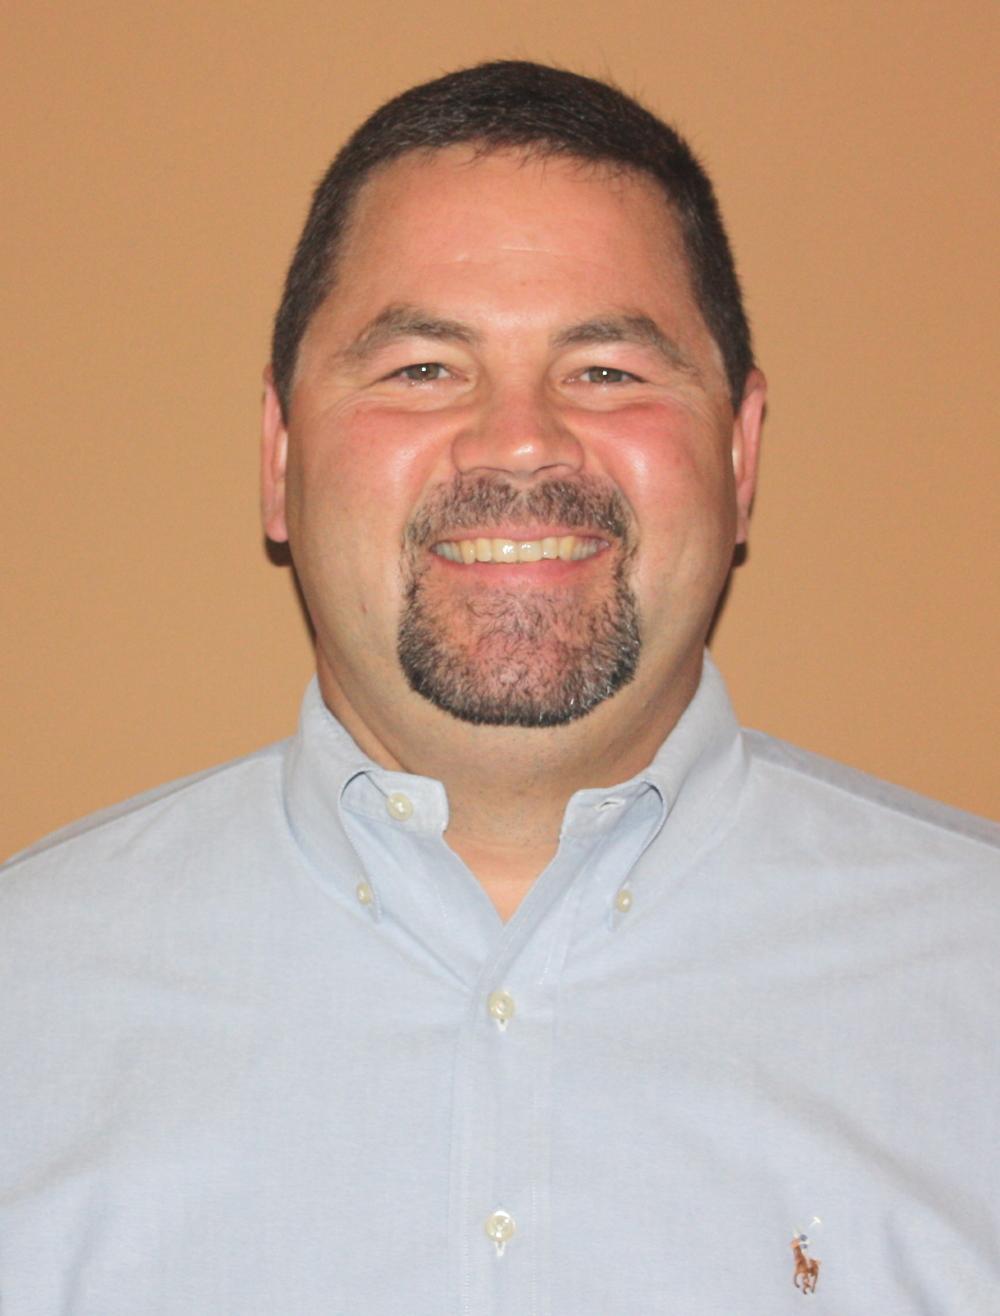 Chris Sexton Southeast Region Sales Manager